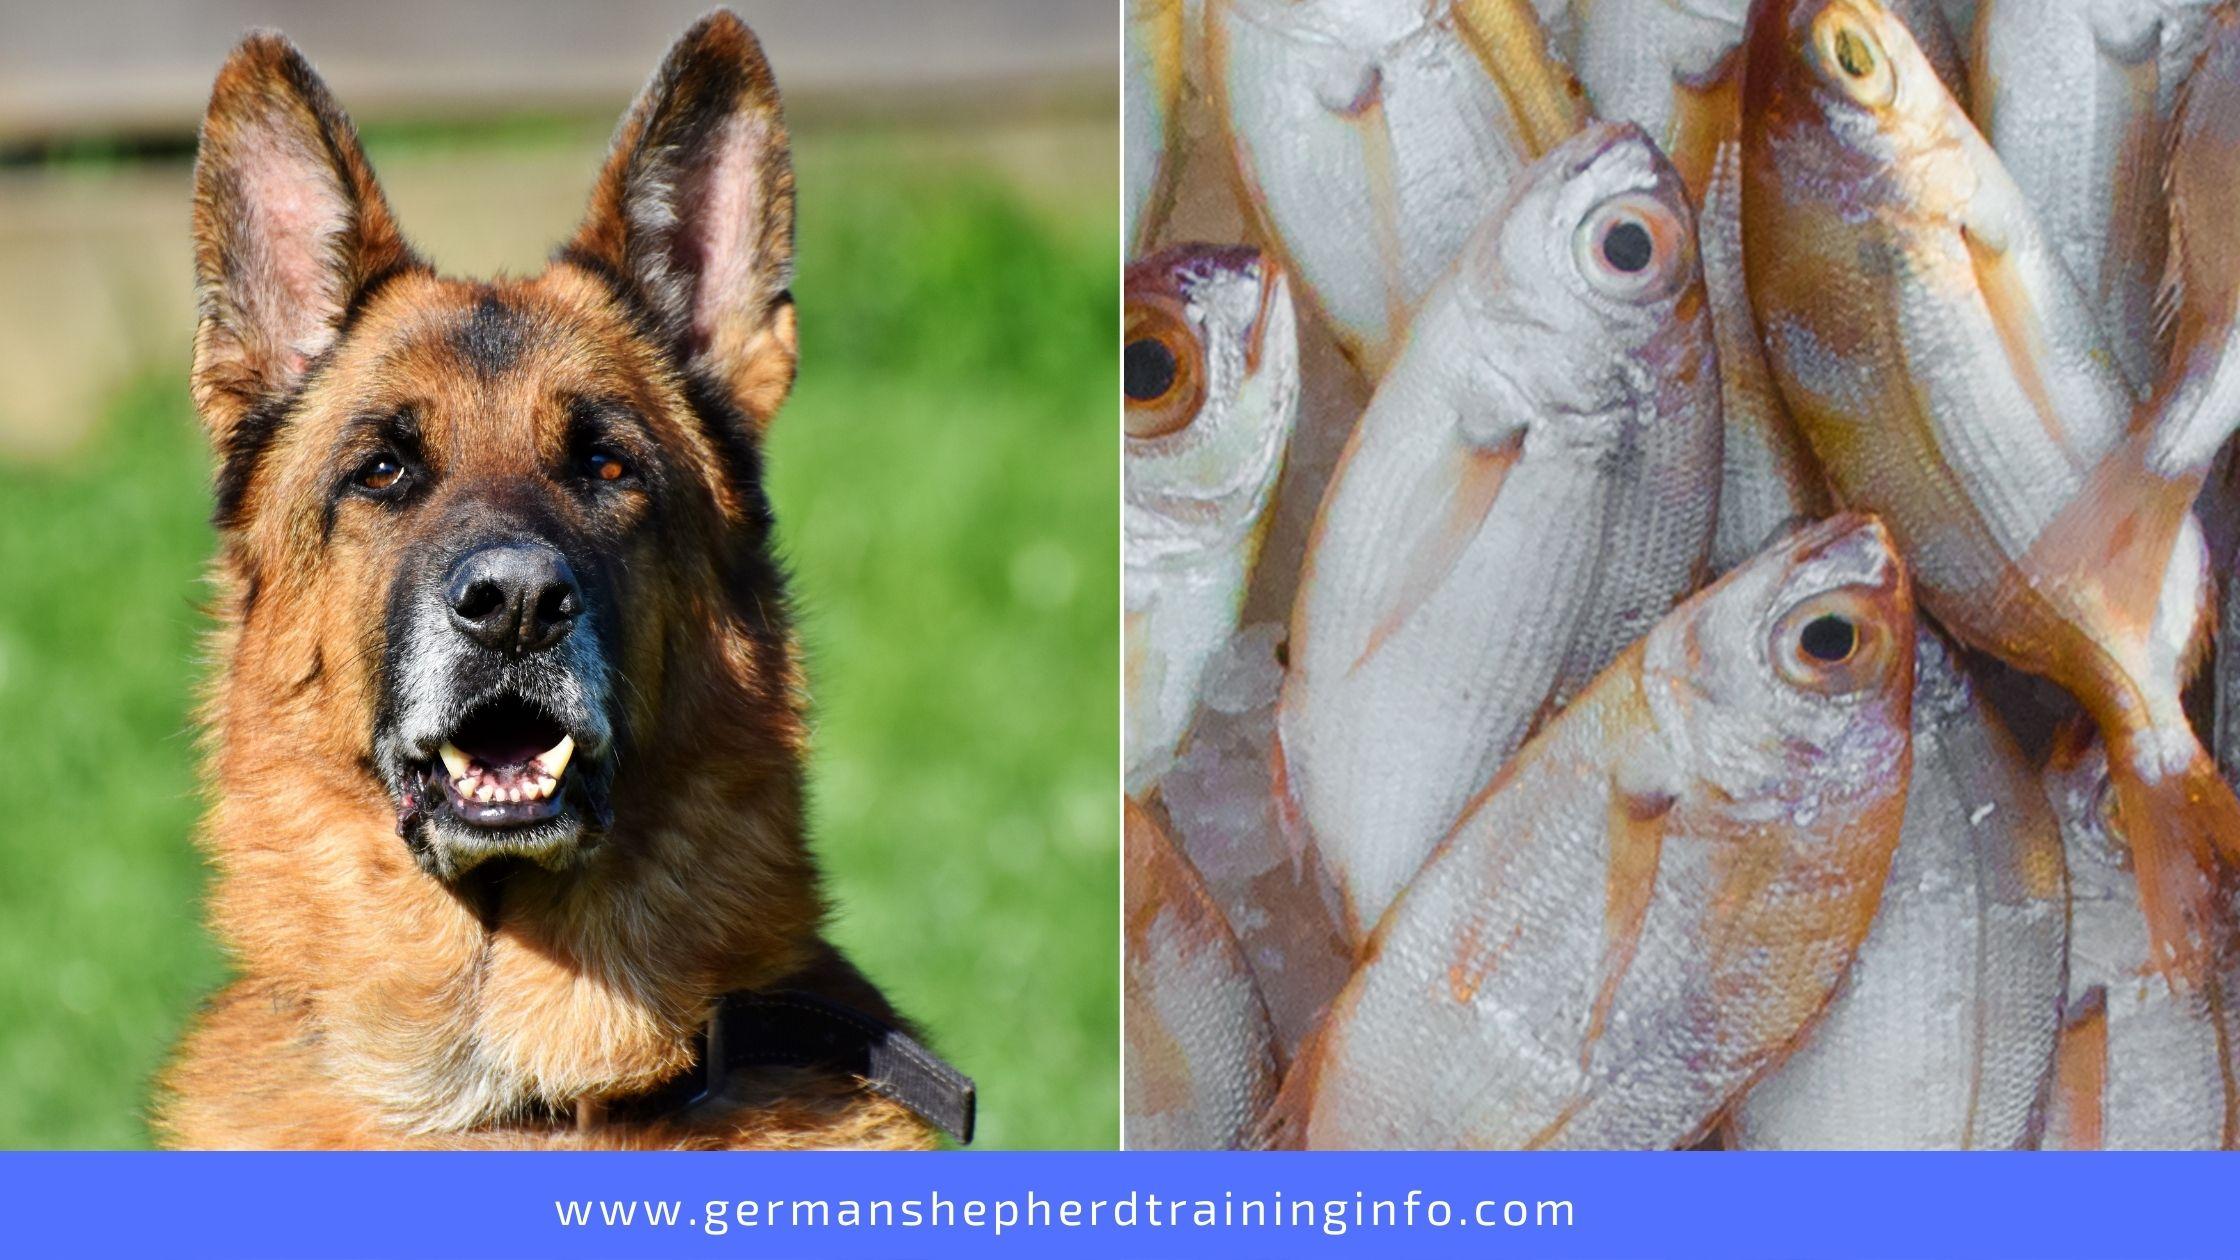 Can German Shepherd Eat Fish?